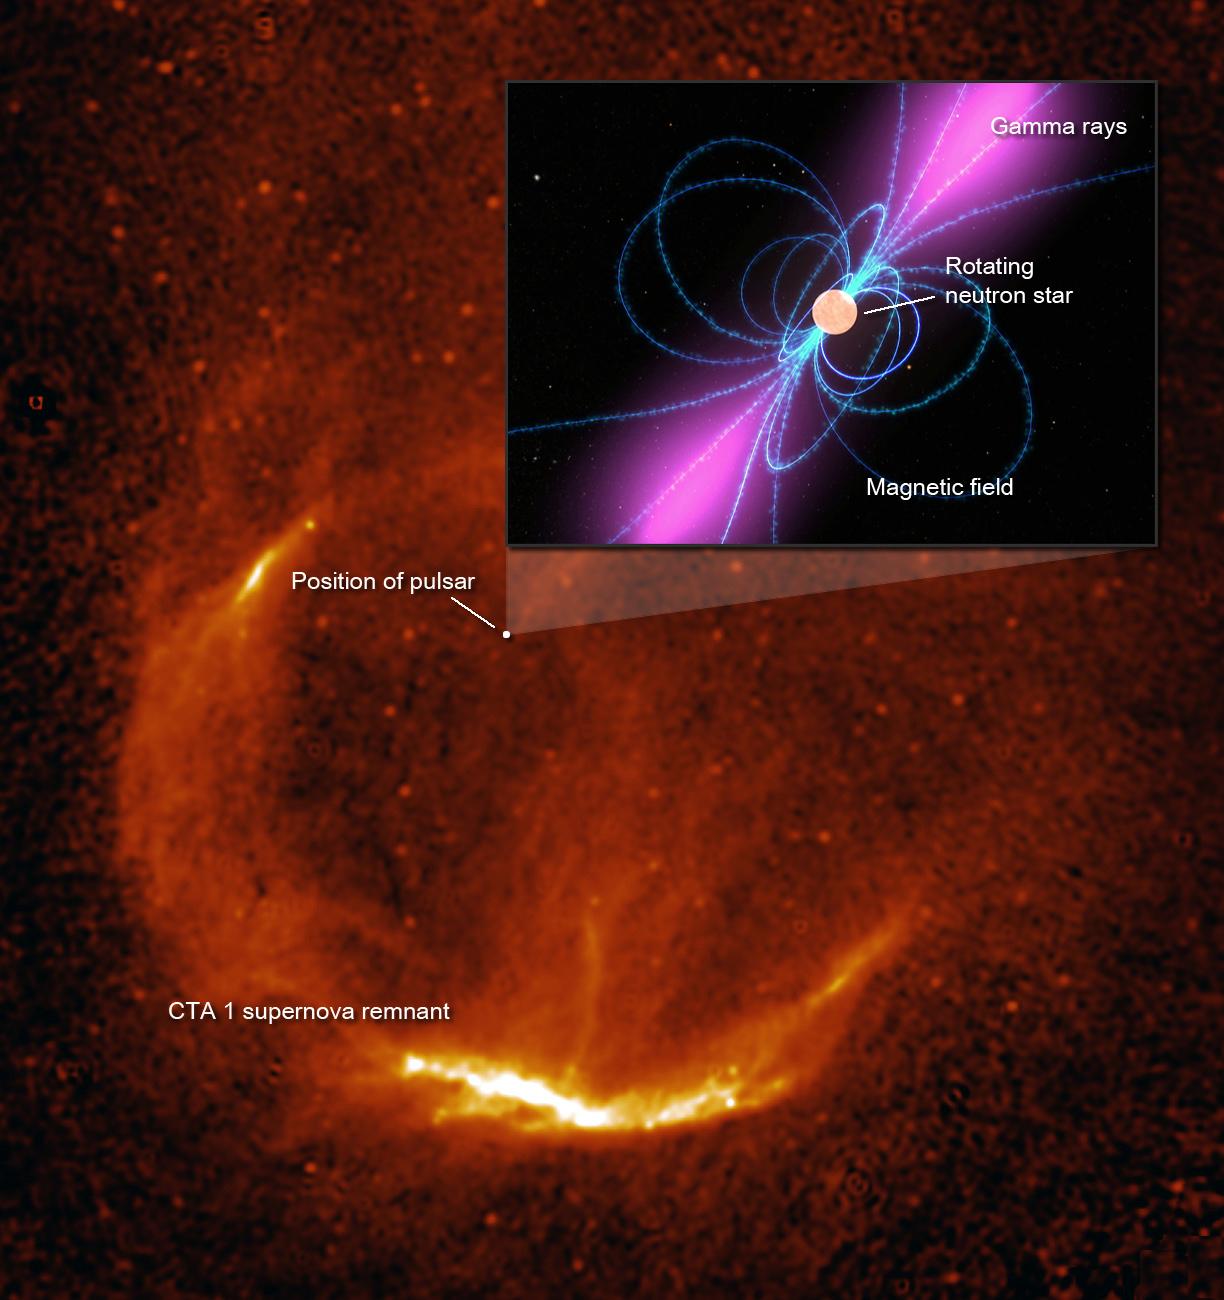 O telescópio espacial Fermi revelou a estrela de nêutrons na remanescente de supernova CTA-1. Crédito: NASA, S. Pineault (DRAO) {1}